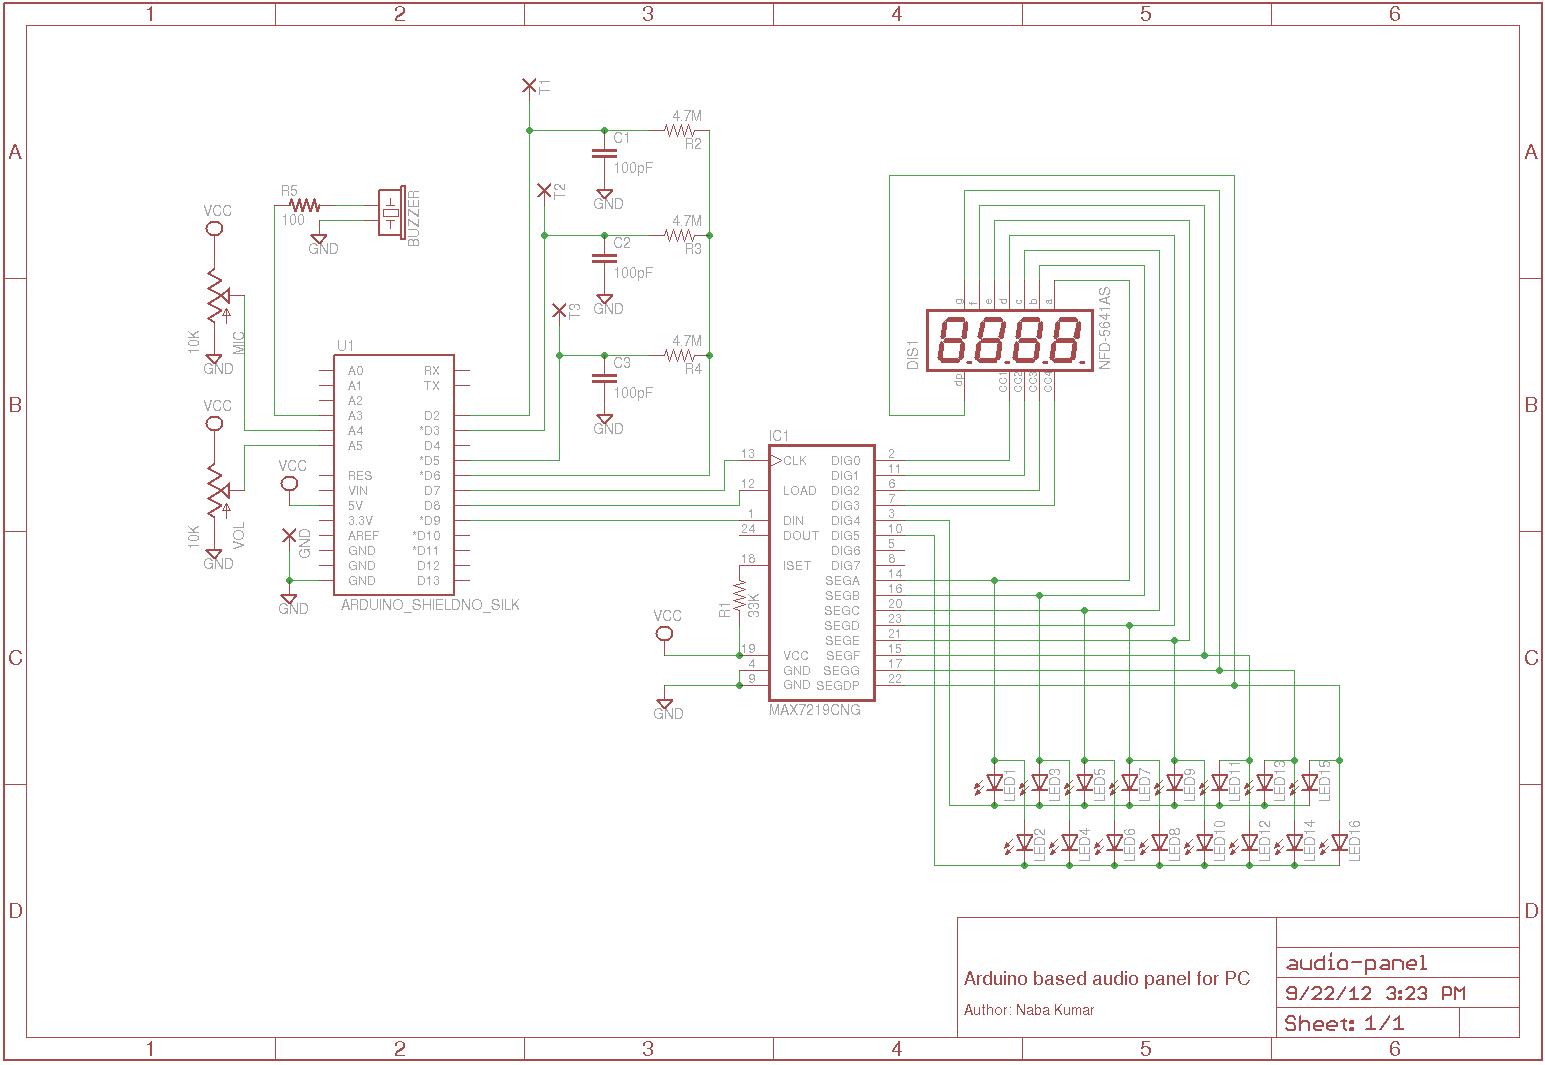 Arduino Analog audio panel schematic